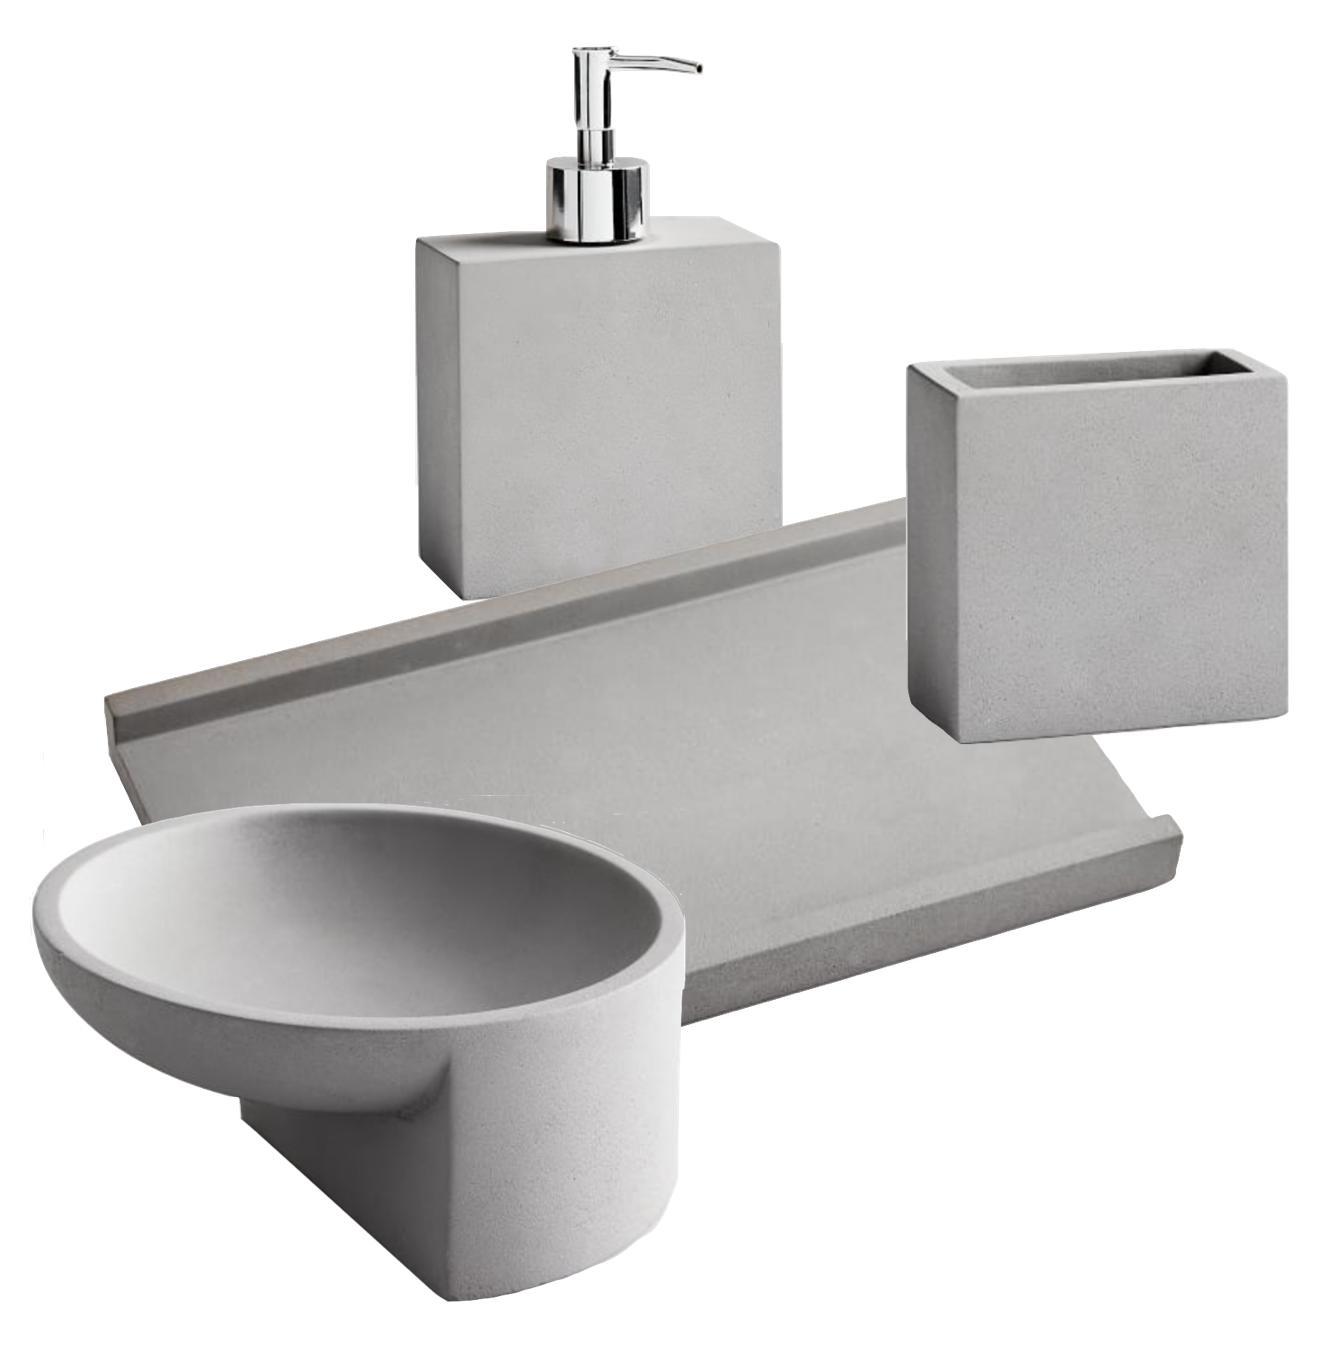 Concrete Bathroom Accessory Collection